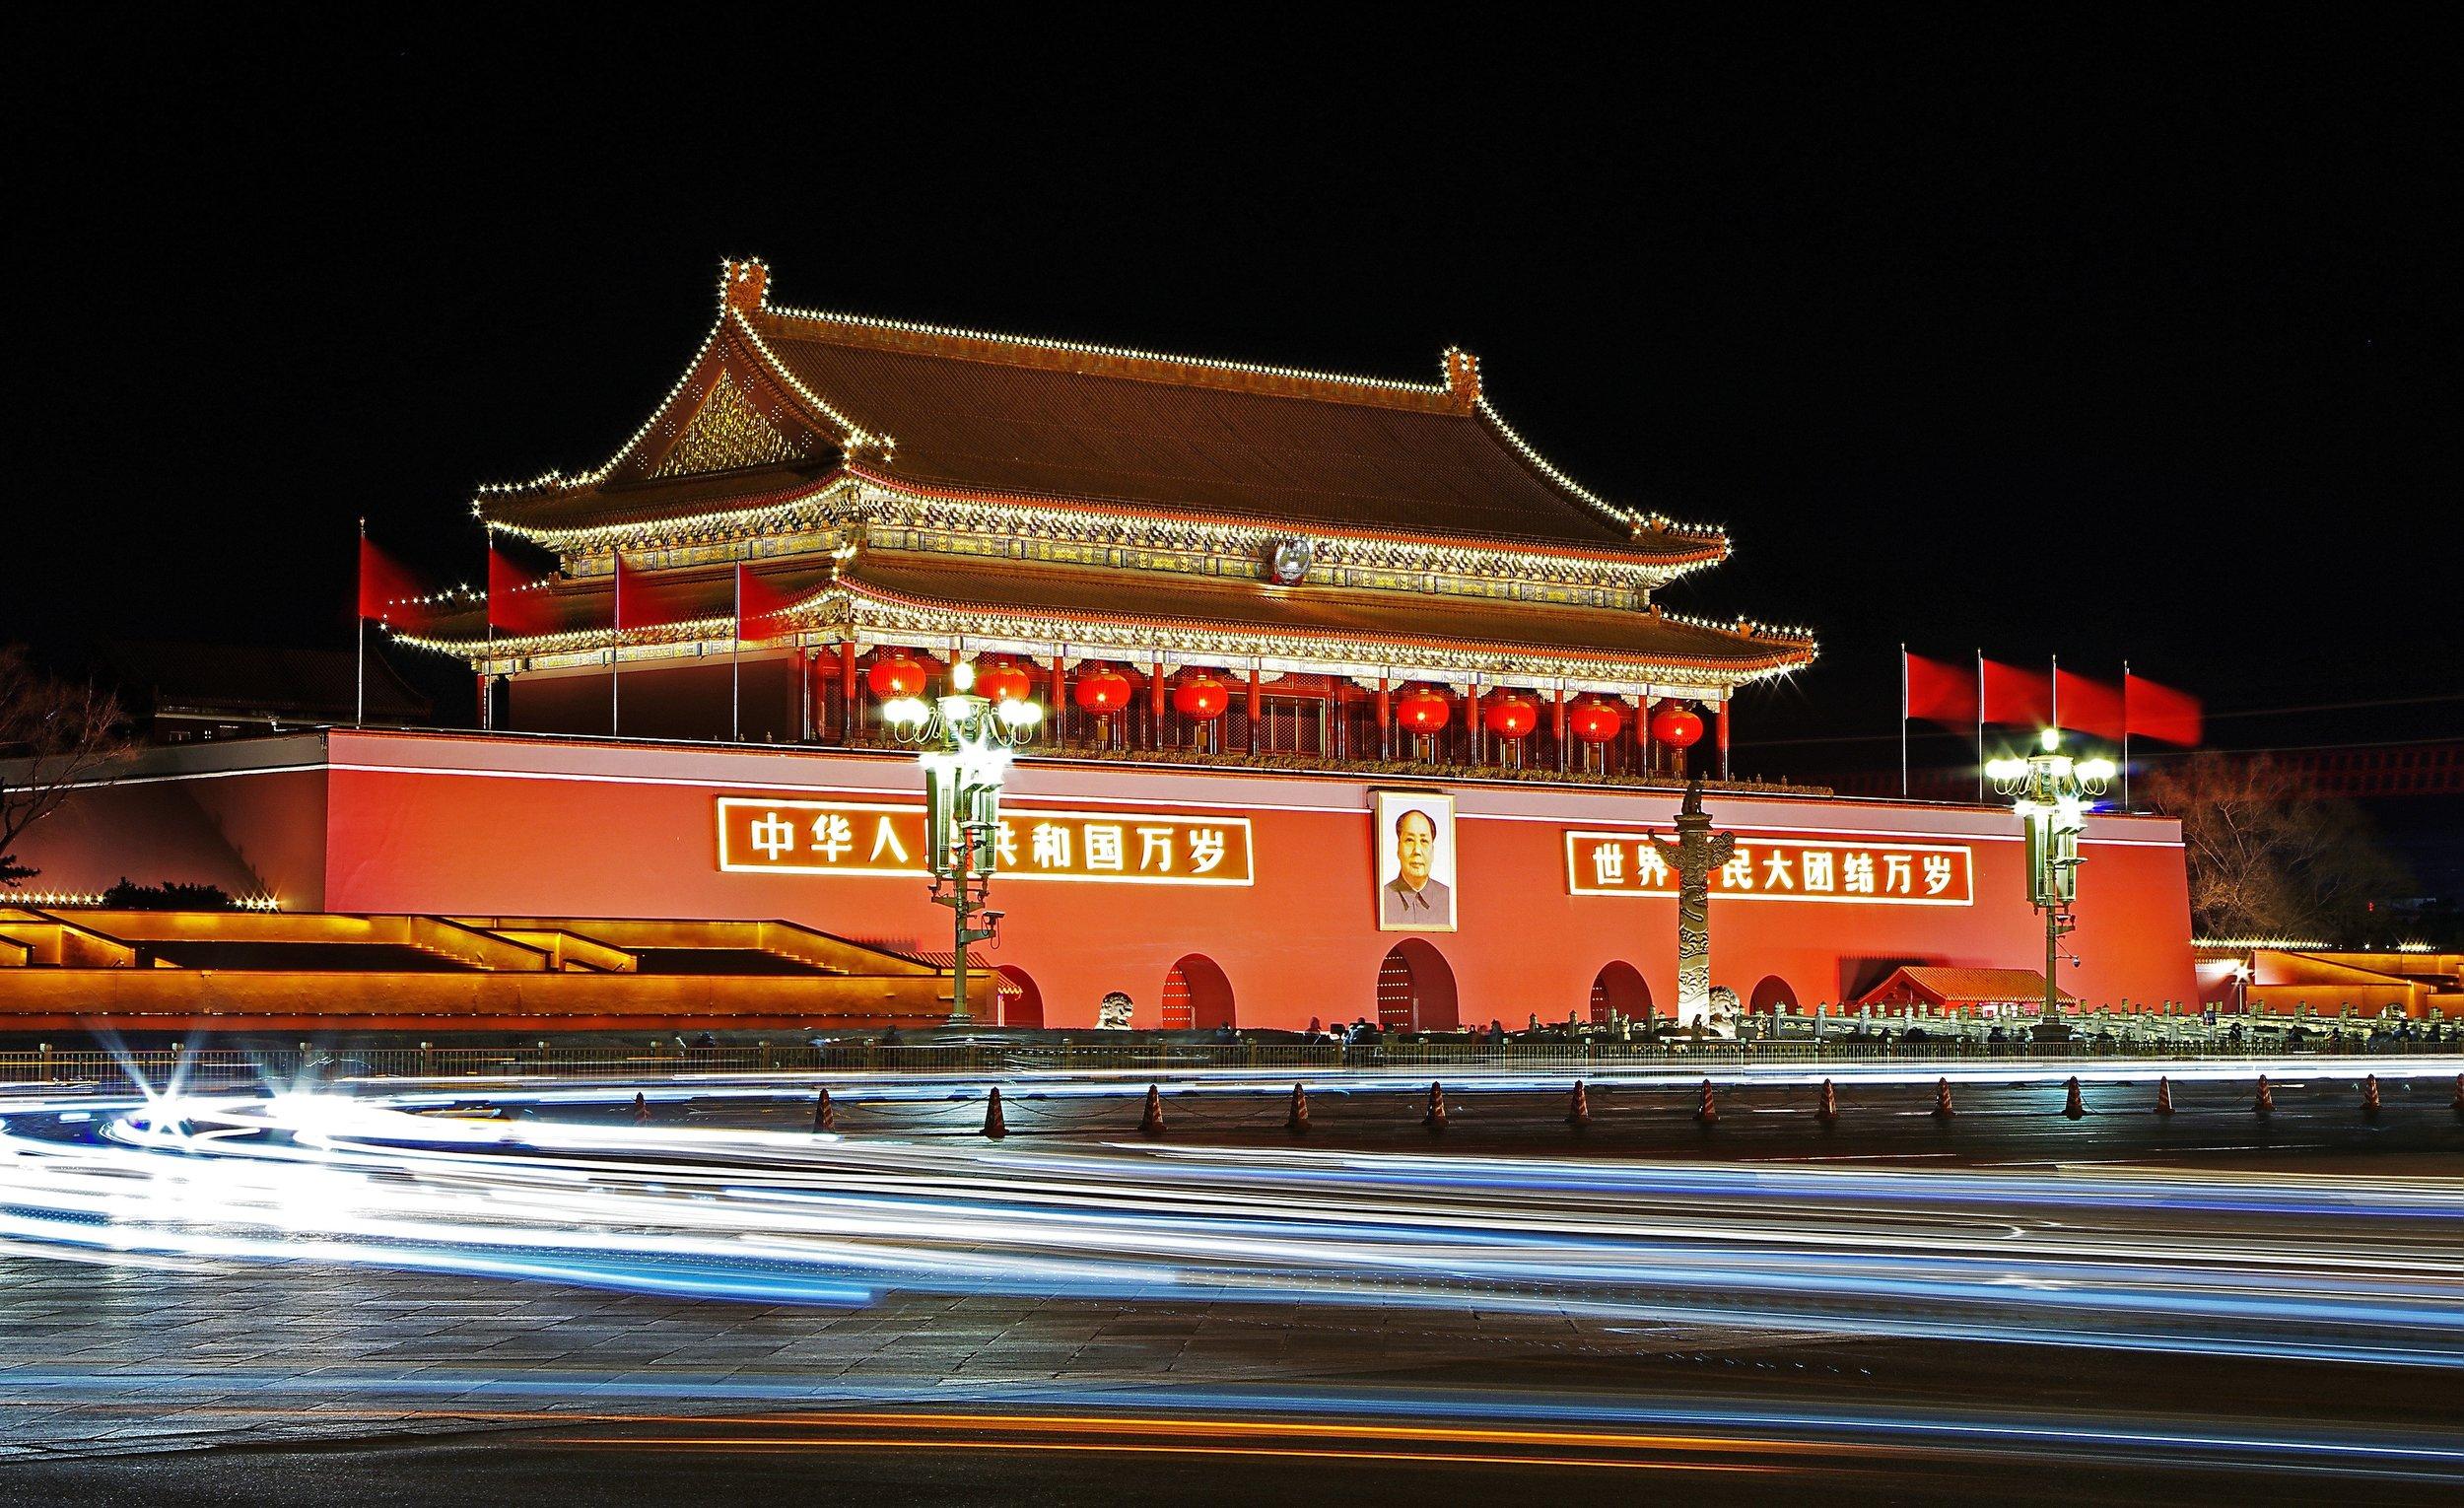 wu-yi-137078-unsplash.jpg